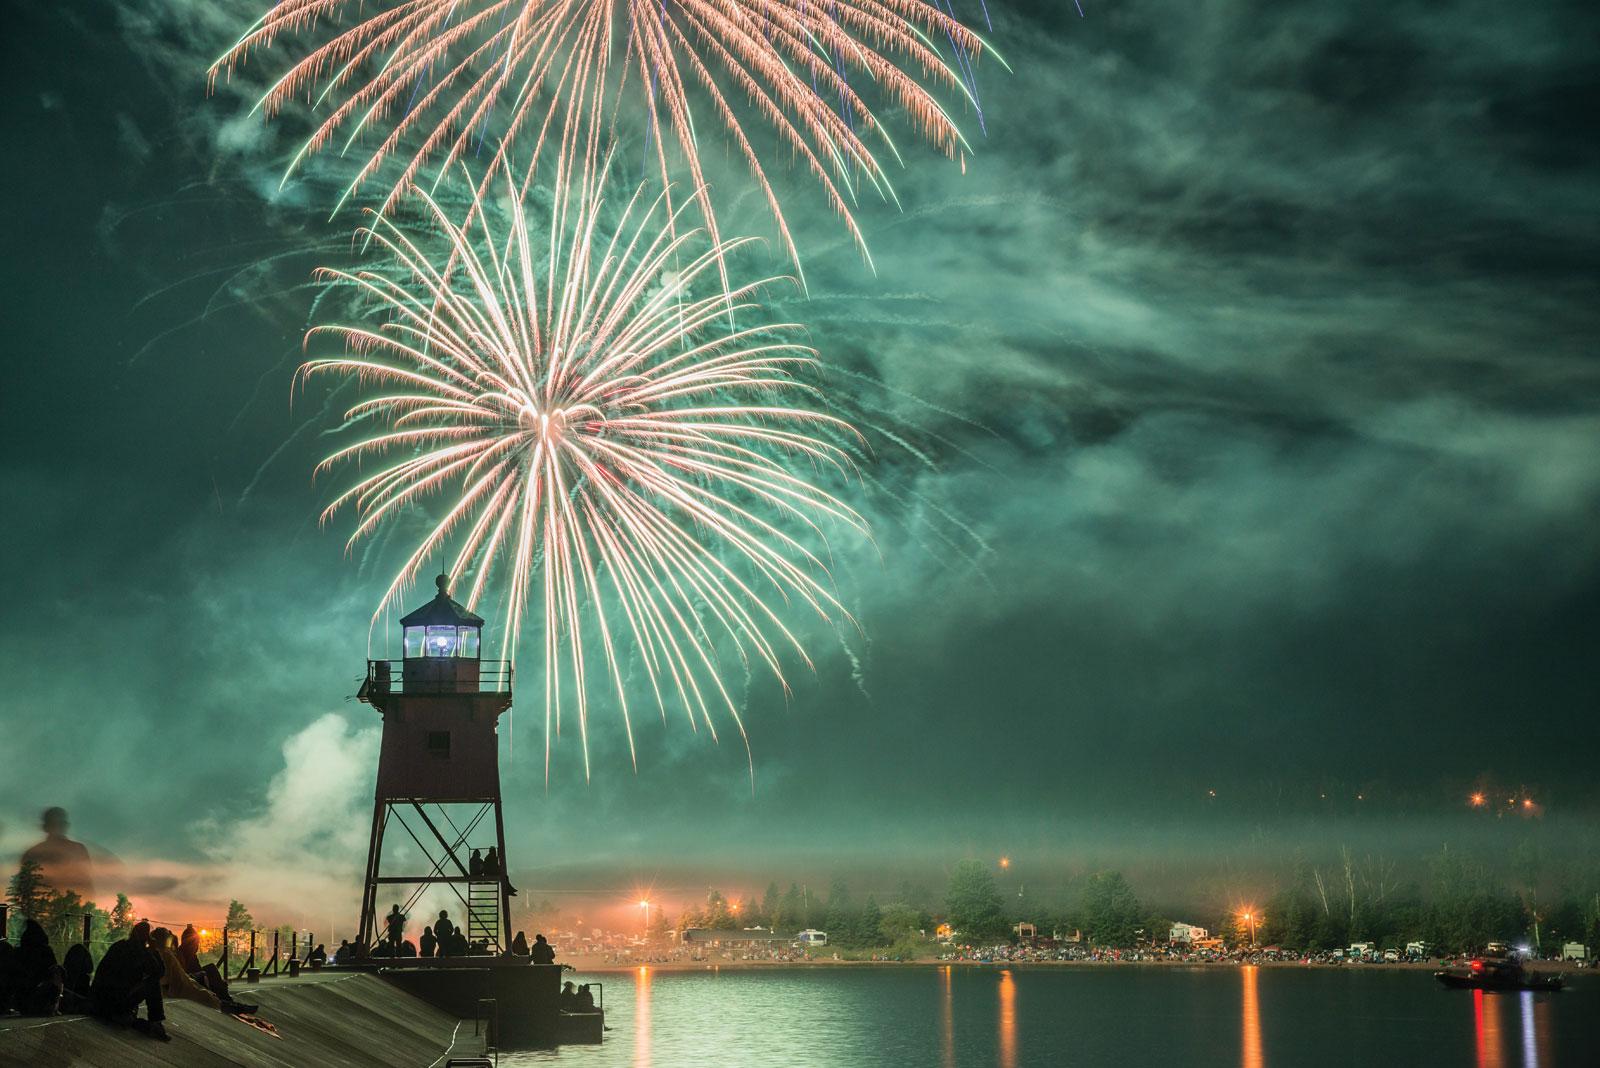 Fireworks over the Grand Marais lighthouse